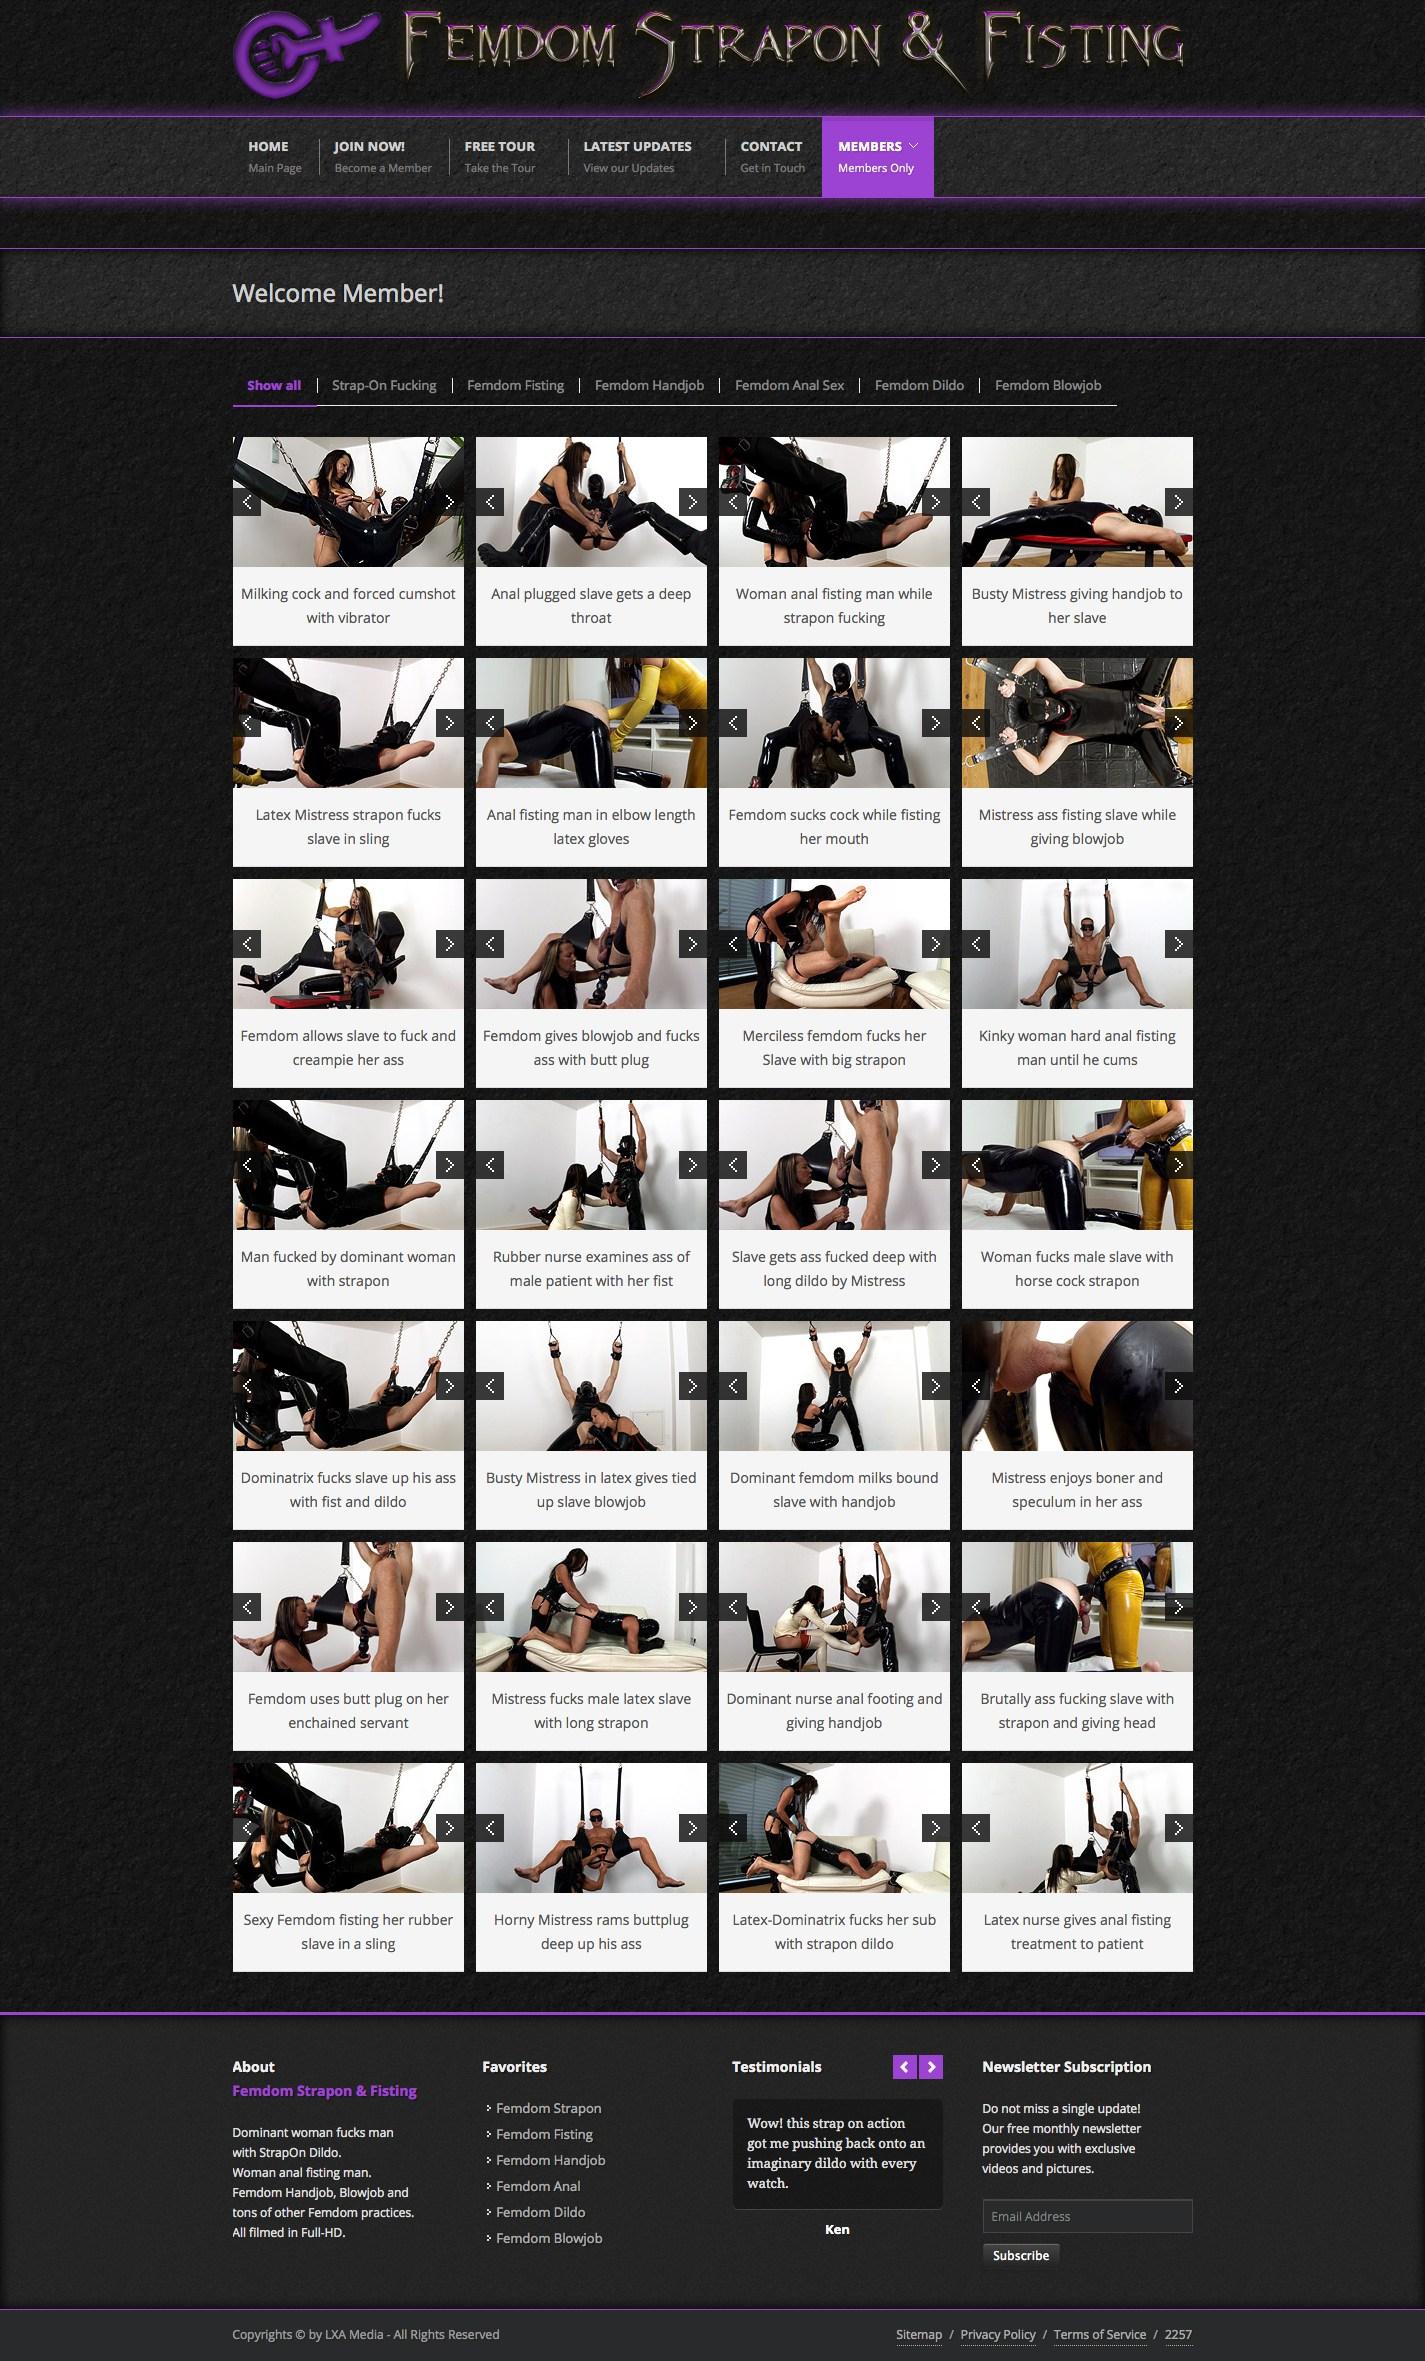 Femdom Strapon & Fisting photos